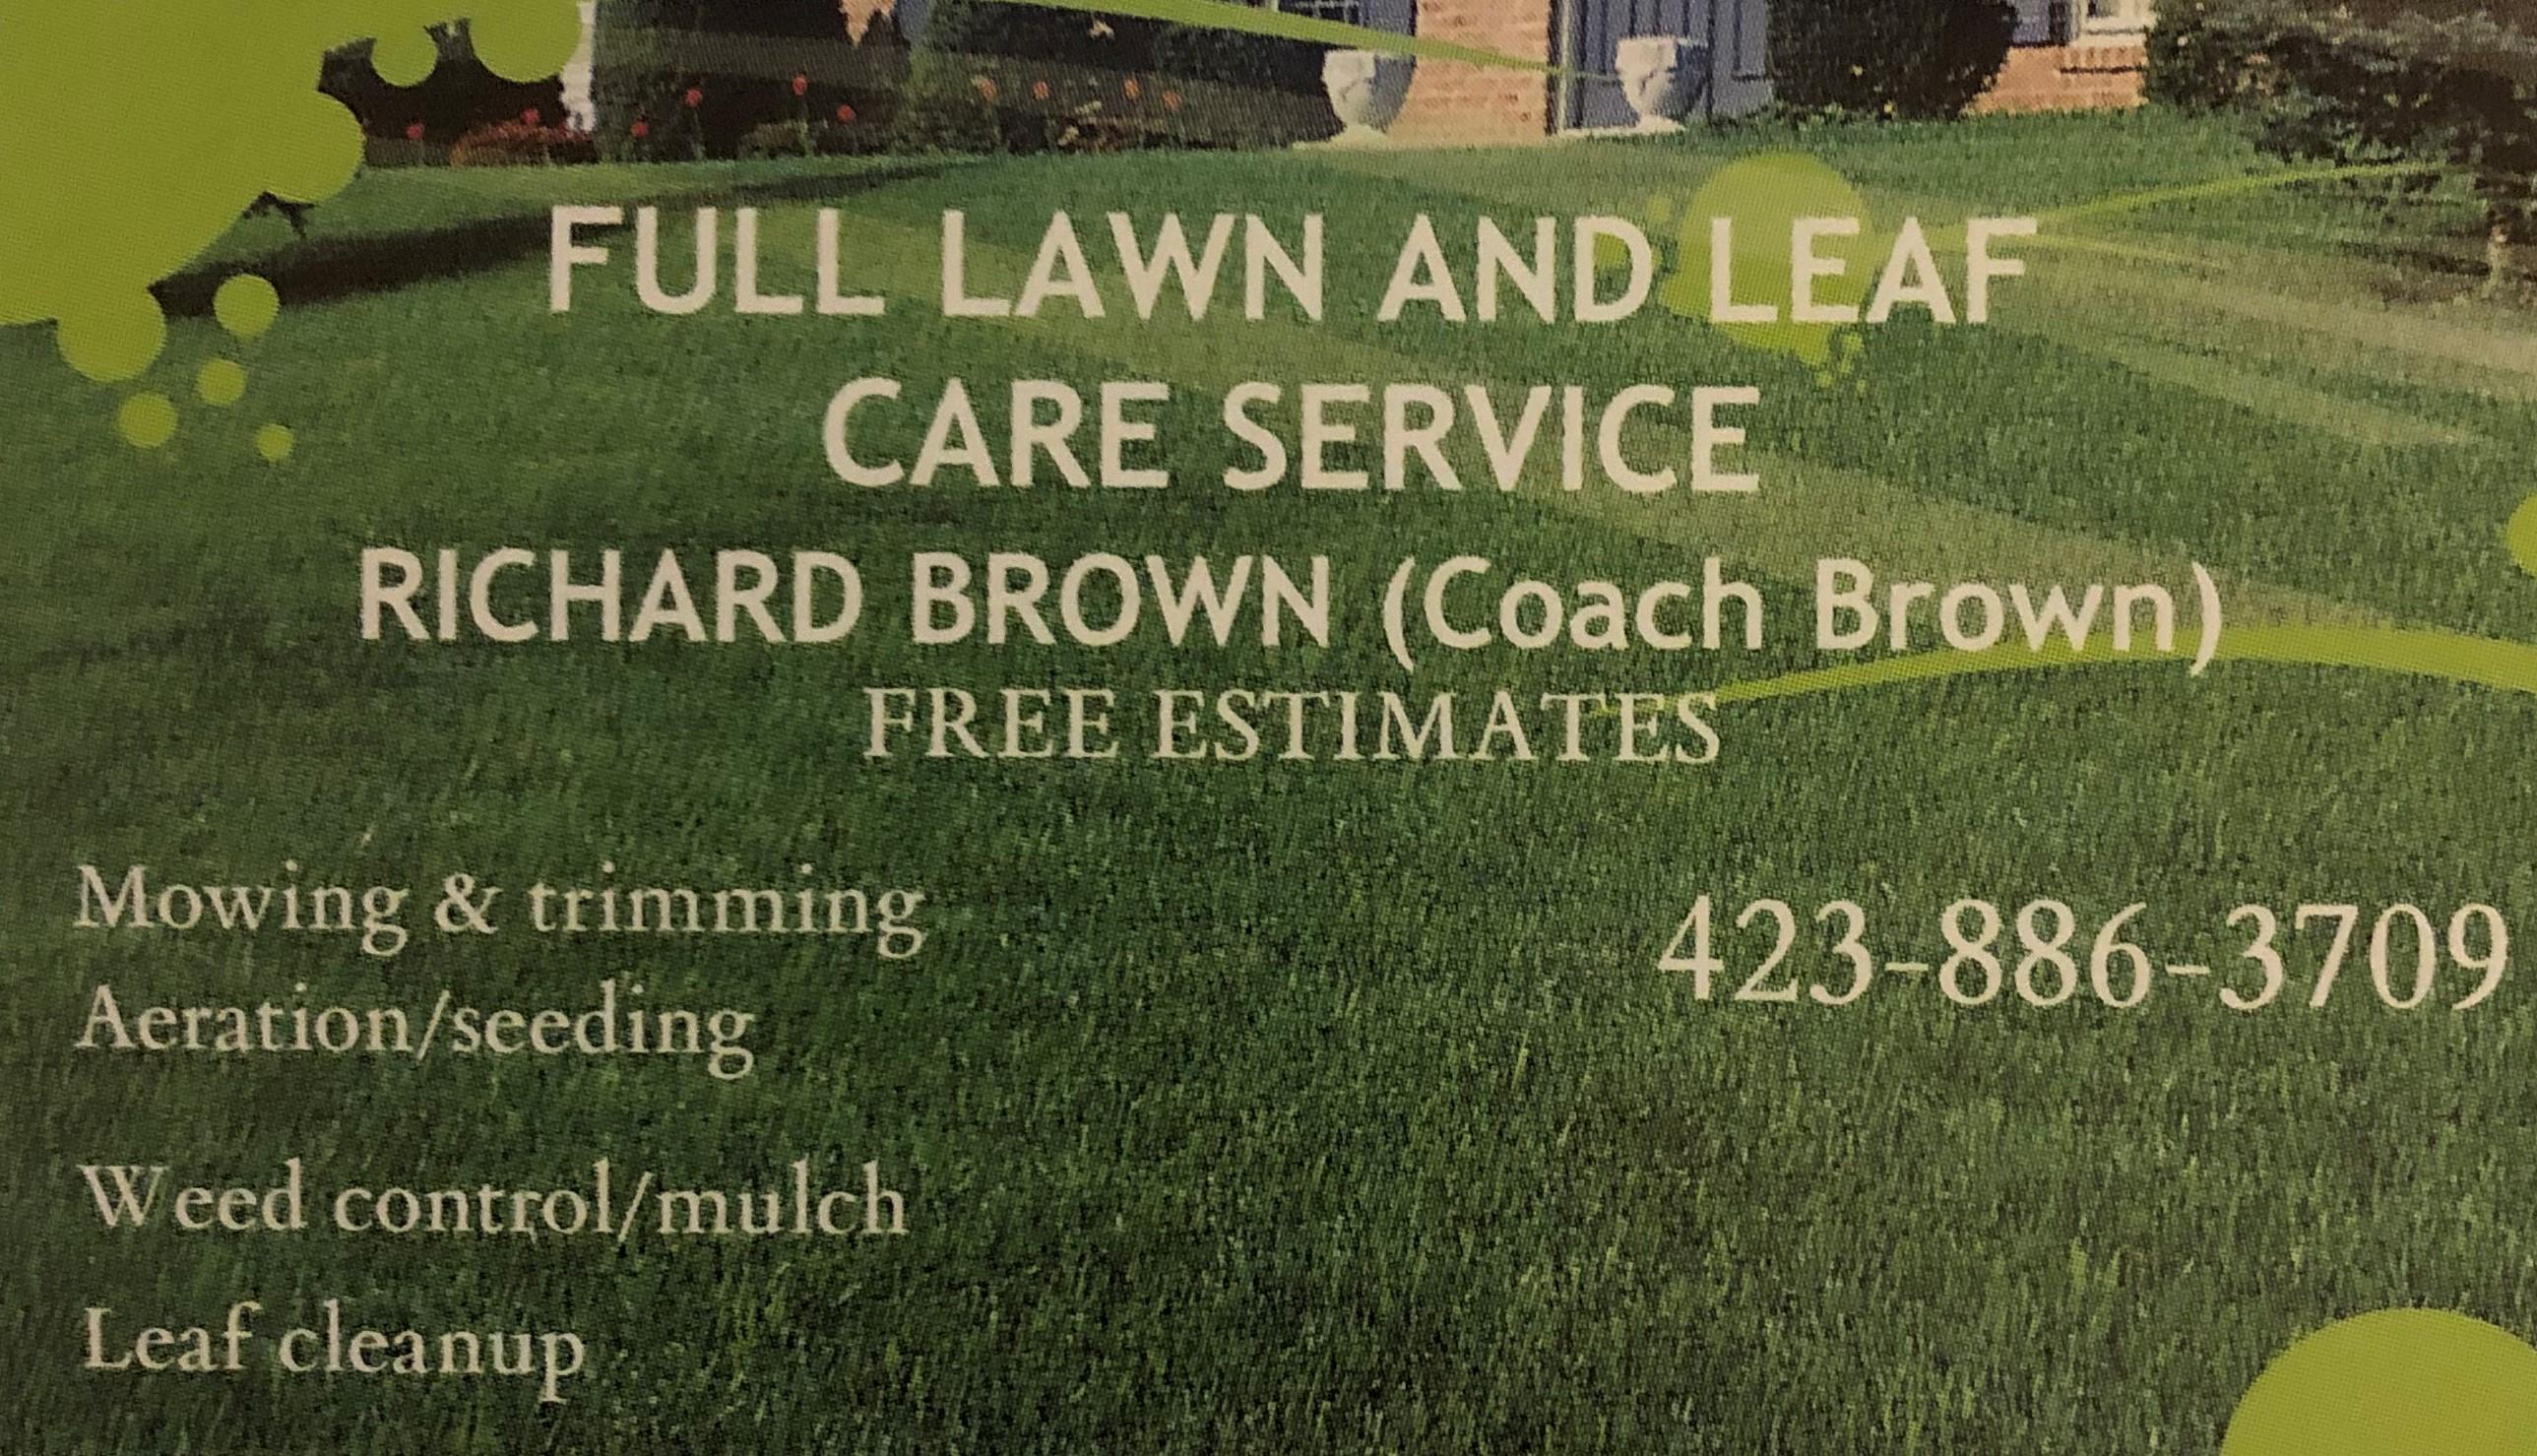 Full Lawn & Leaf Care Service